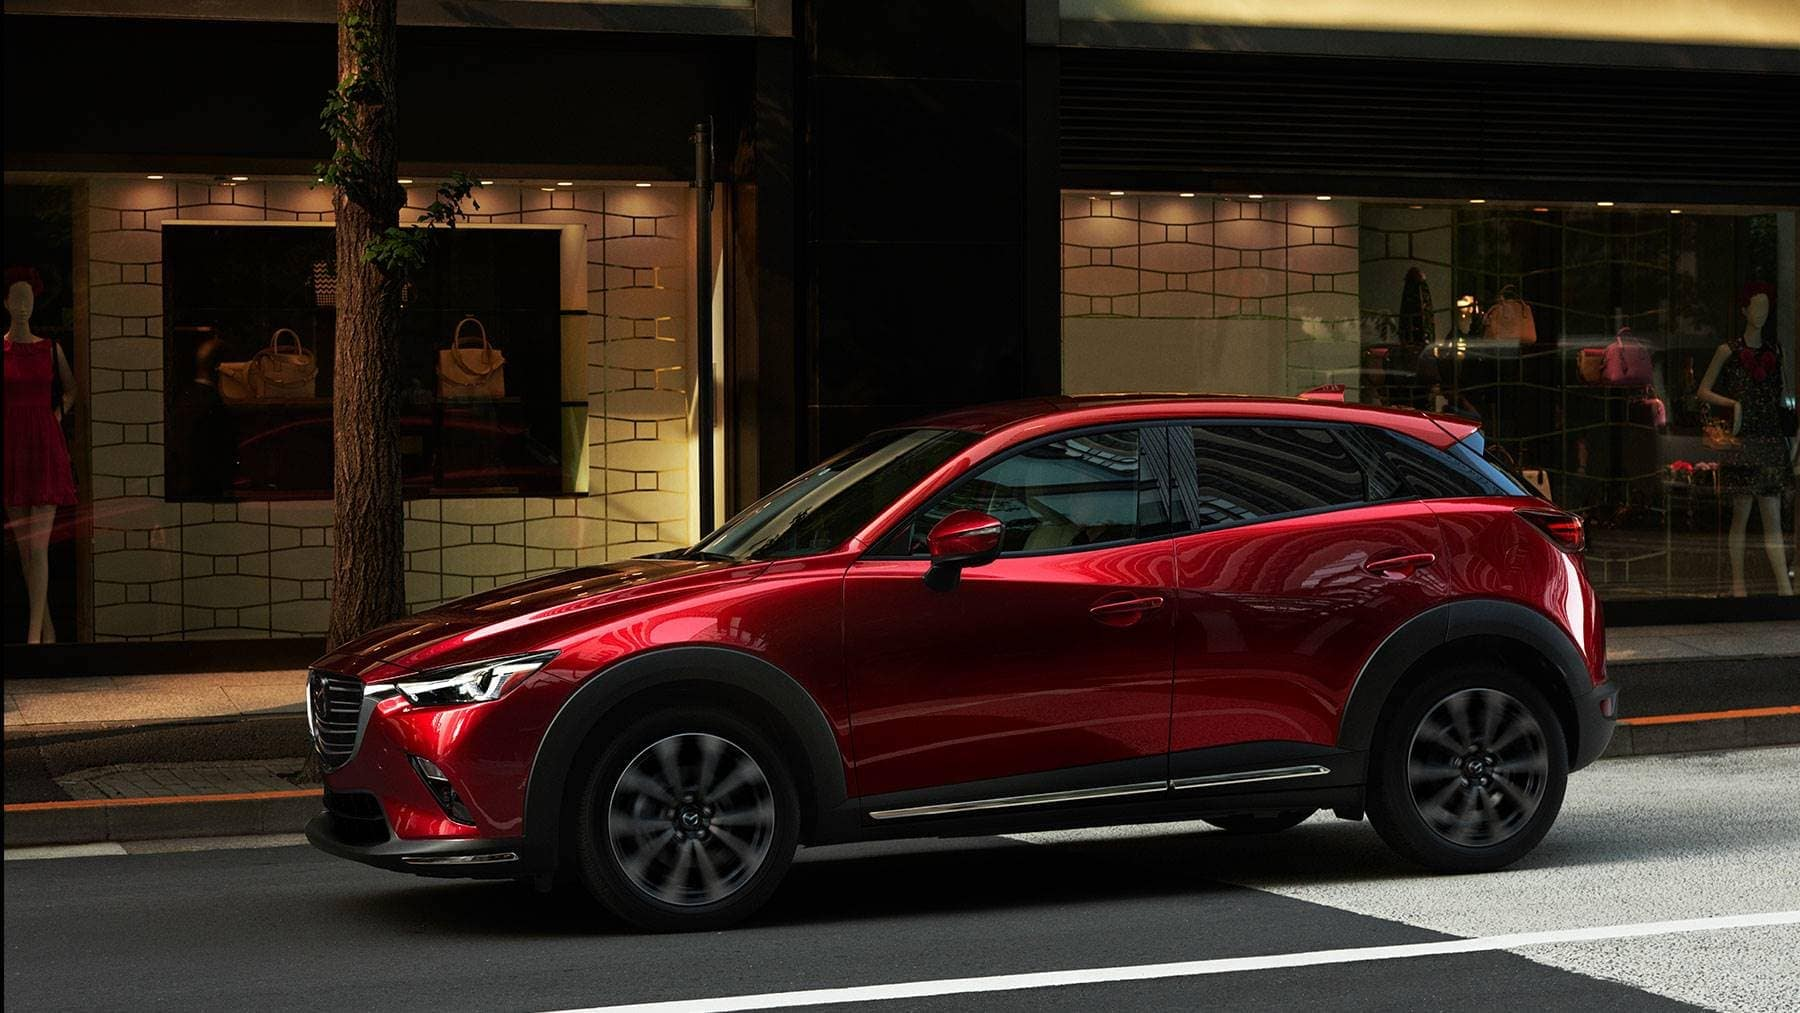 2019 Mazda CX-3 exterior